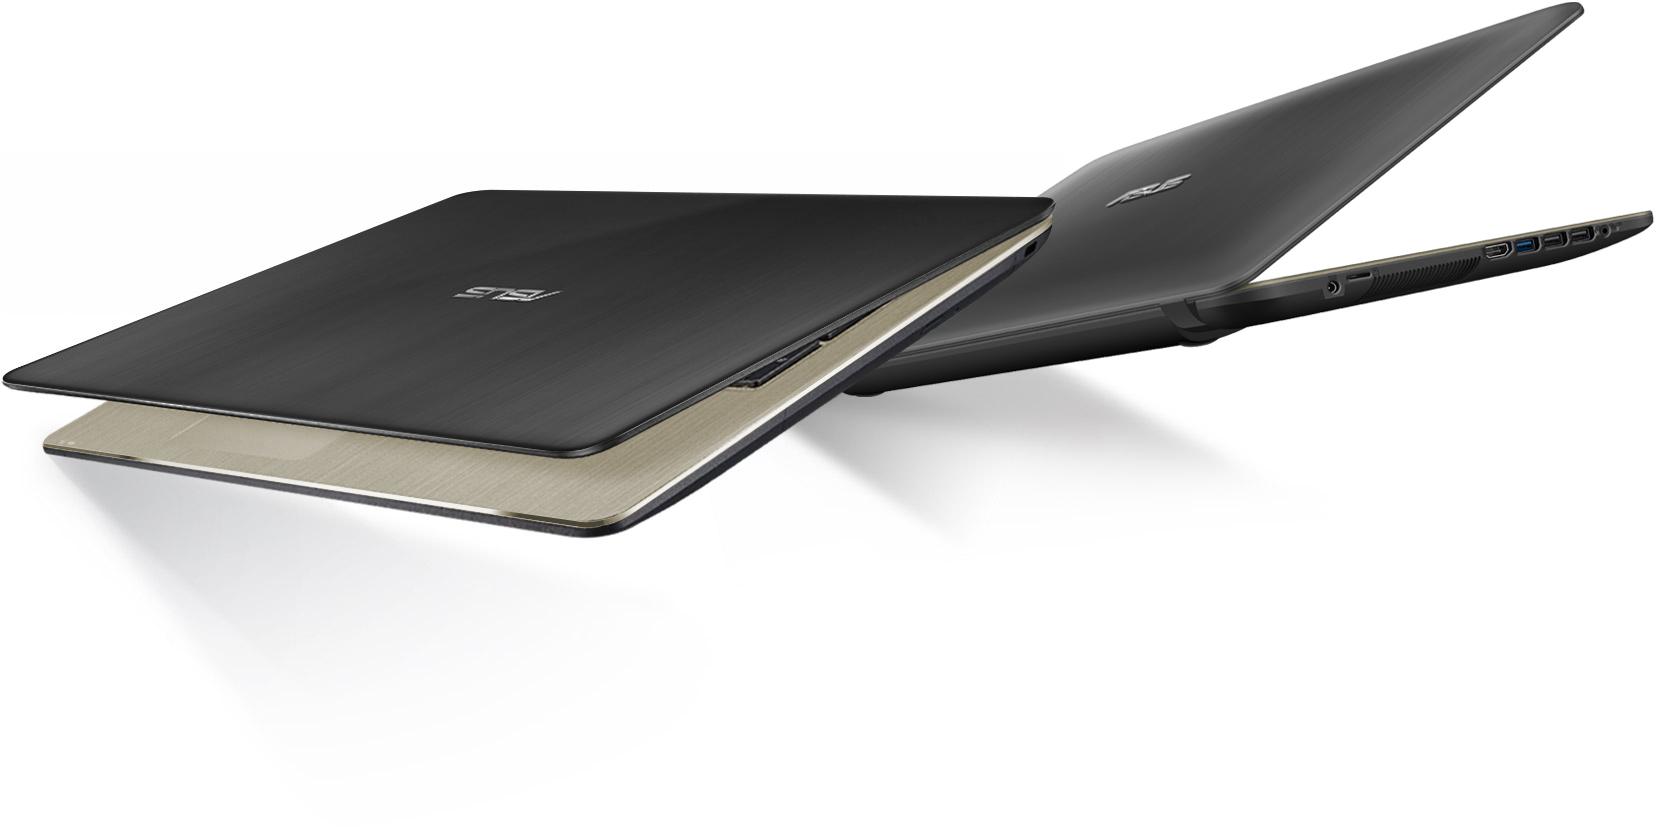 Asus laptop X540 in Kenya Intel celeron 2gb ram 500gb